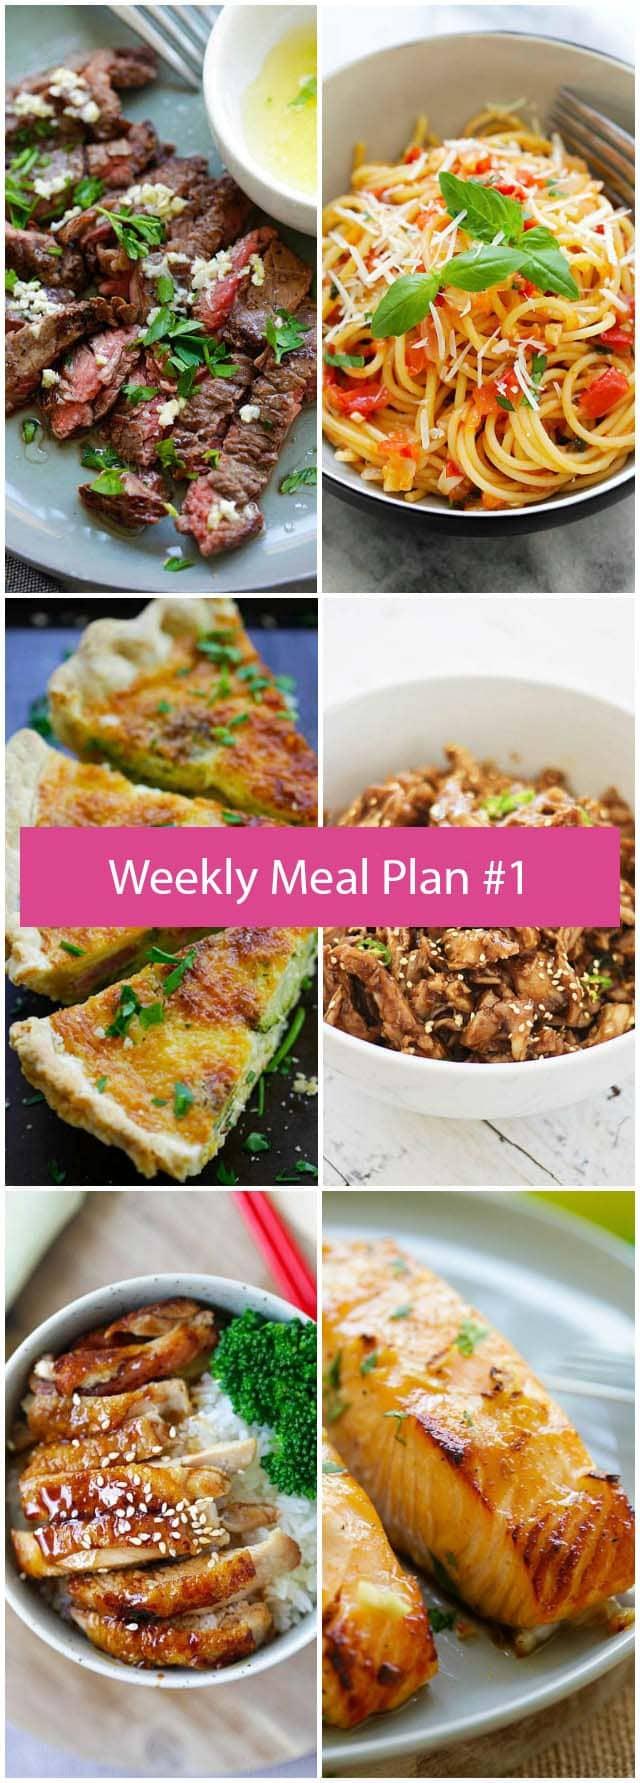 Weekly Meal Plan #1 | RasaMalaysia.com